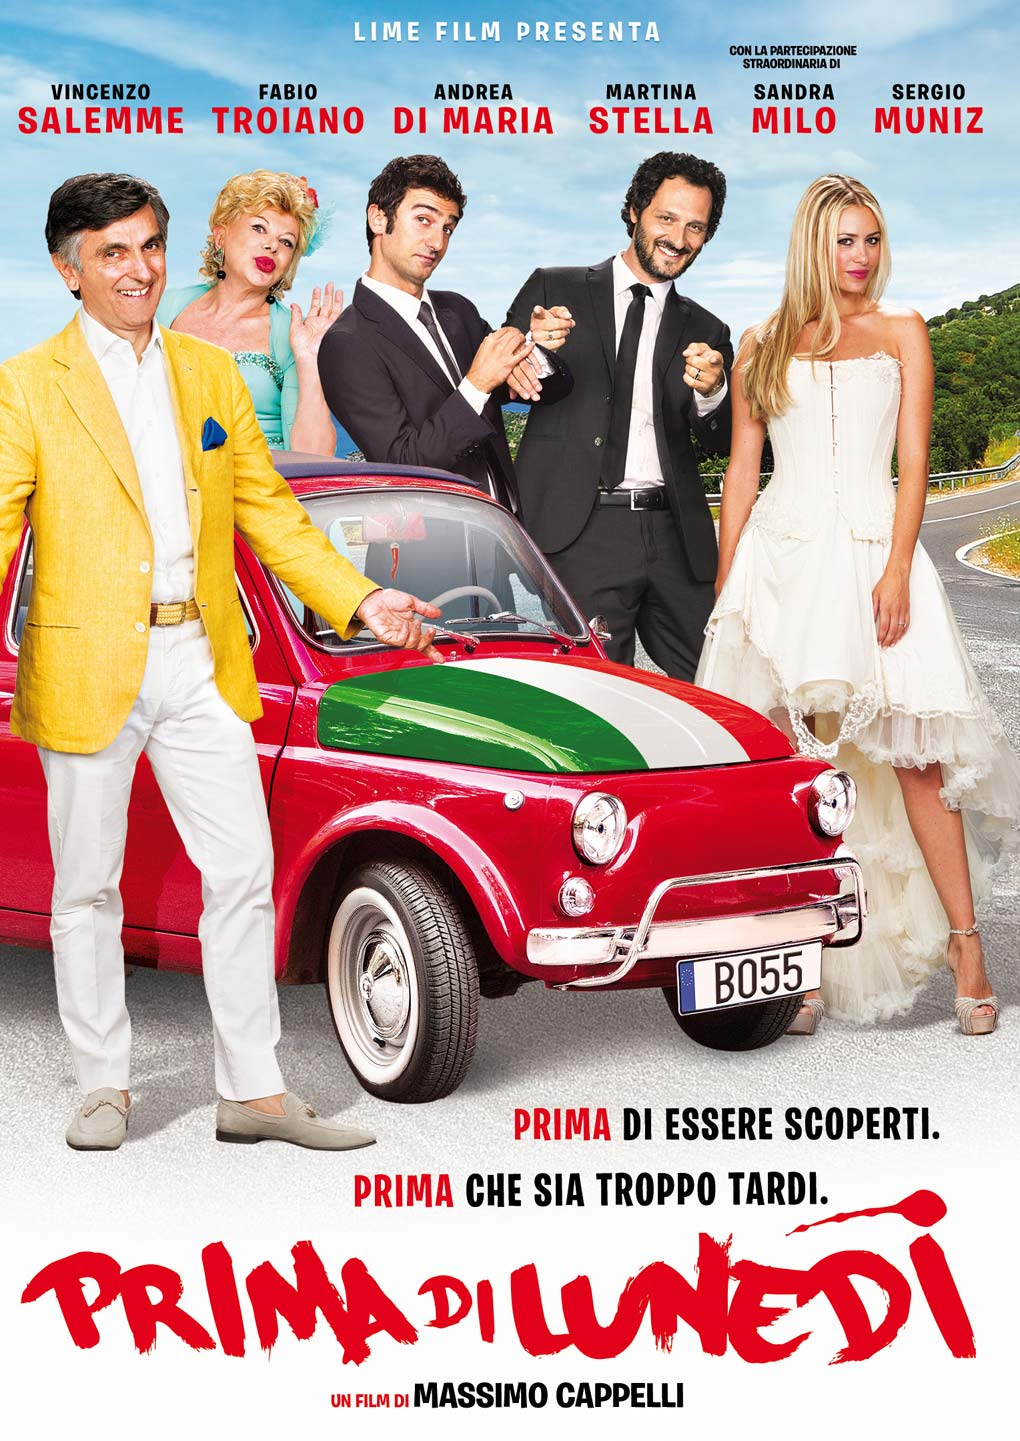 PRIMA DI LUNEDI' (DVD)